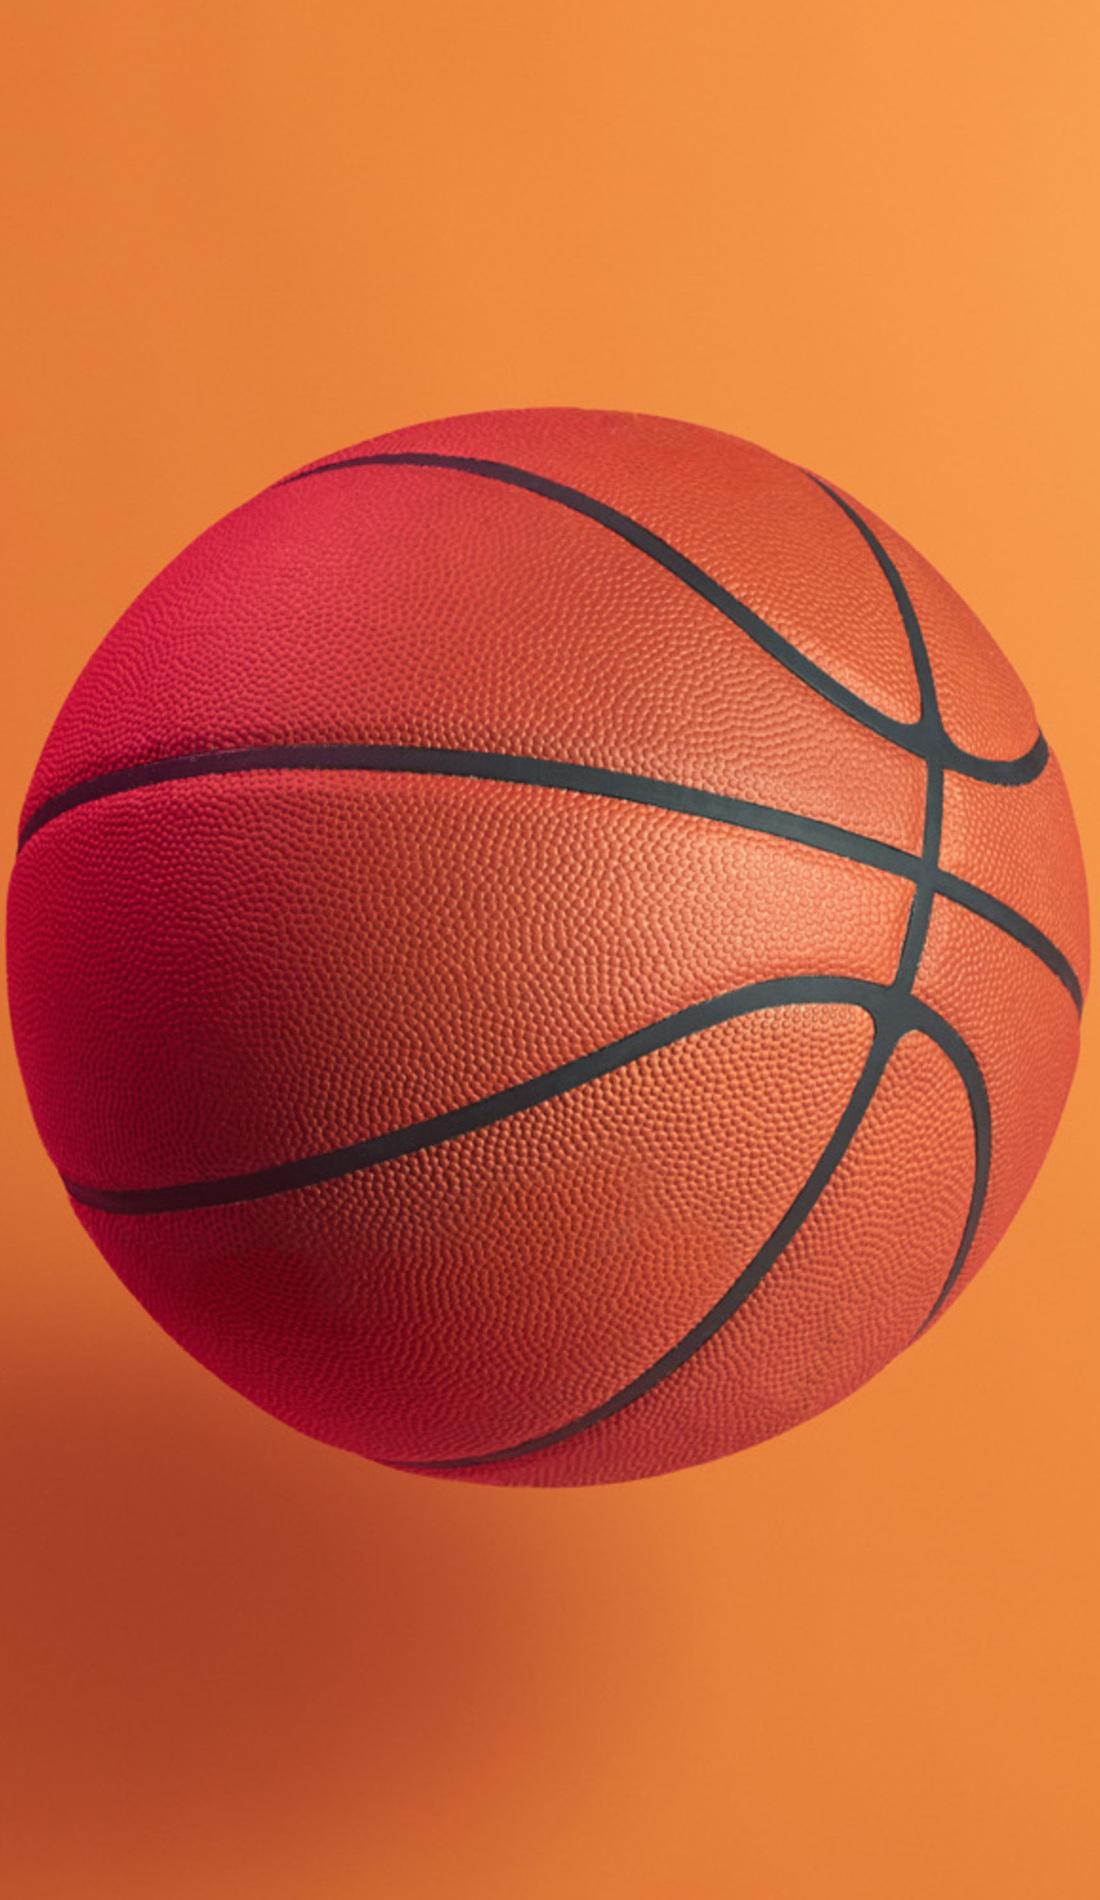 A Big East Women's Basketball Tournament live event